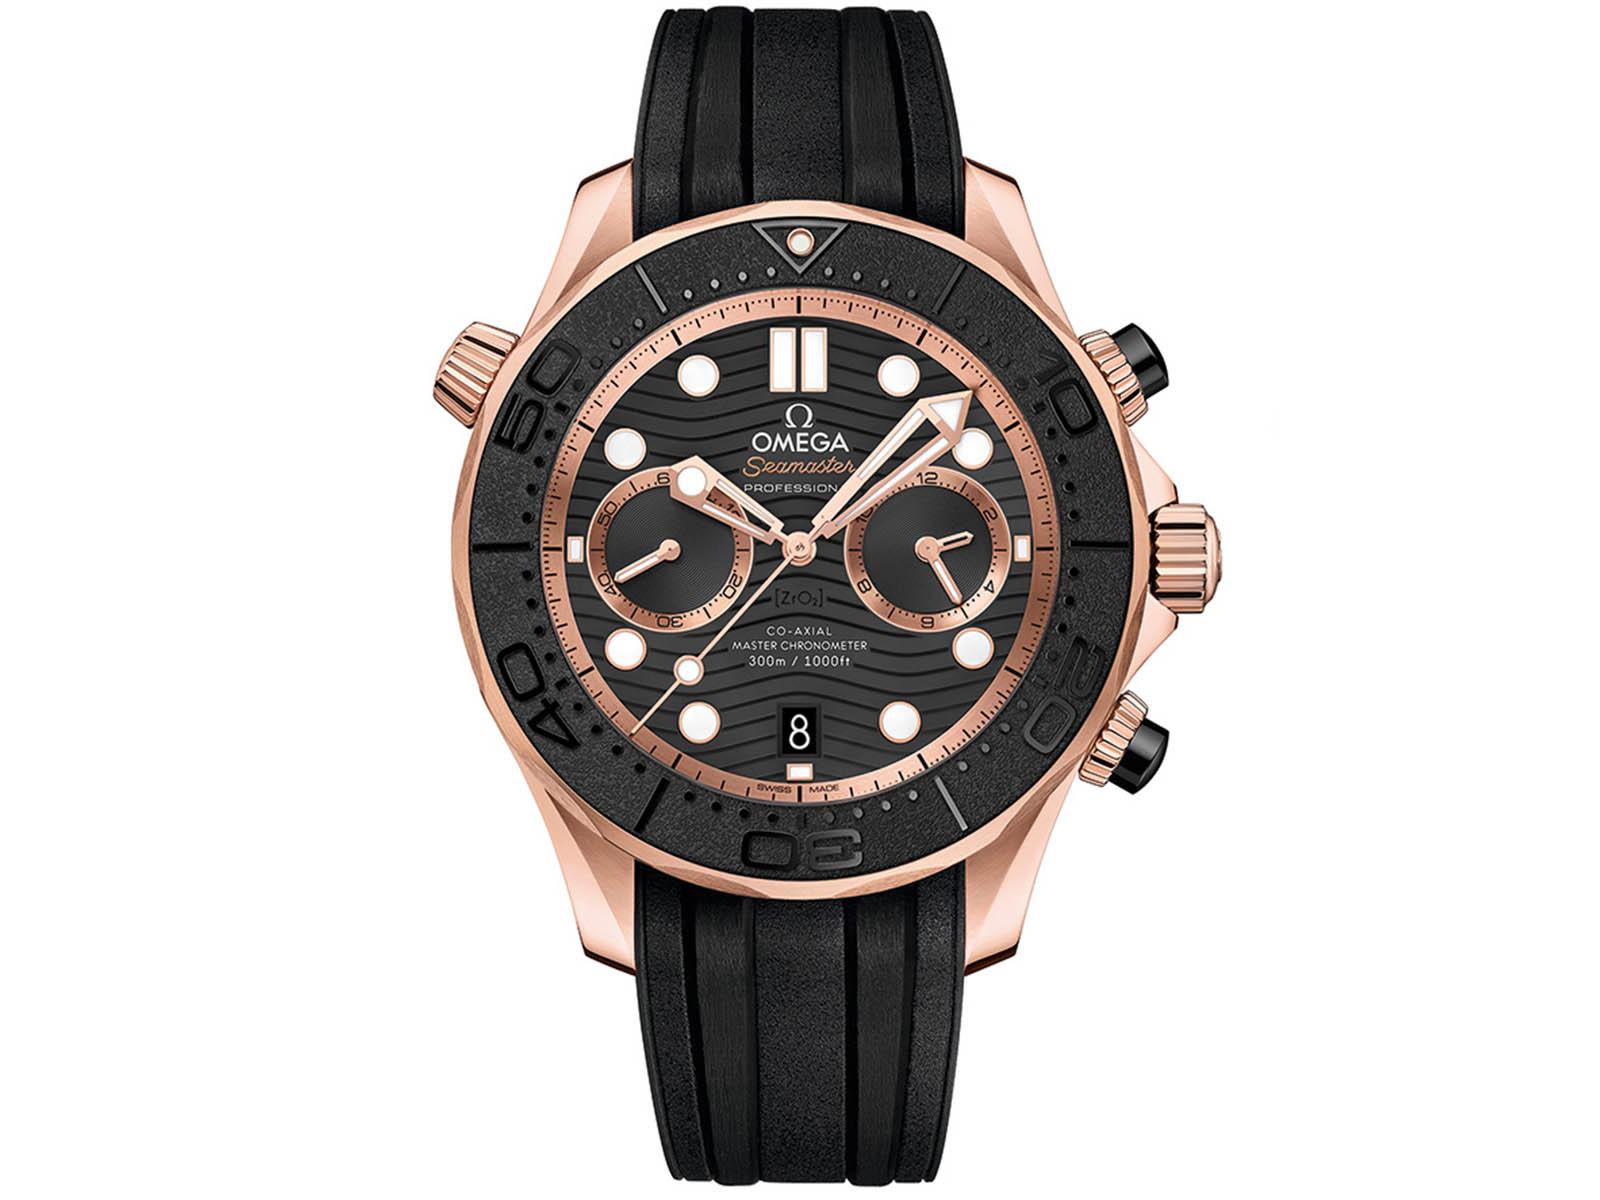 210-62-44-51-01-001-omega-seamaster-diver-300m-chronograph-4.jpg